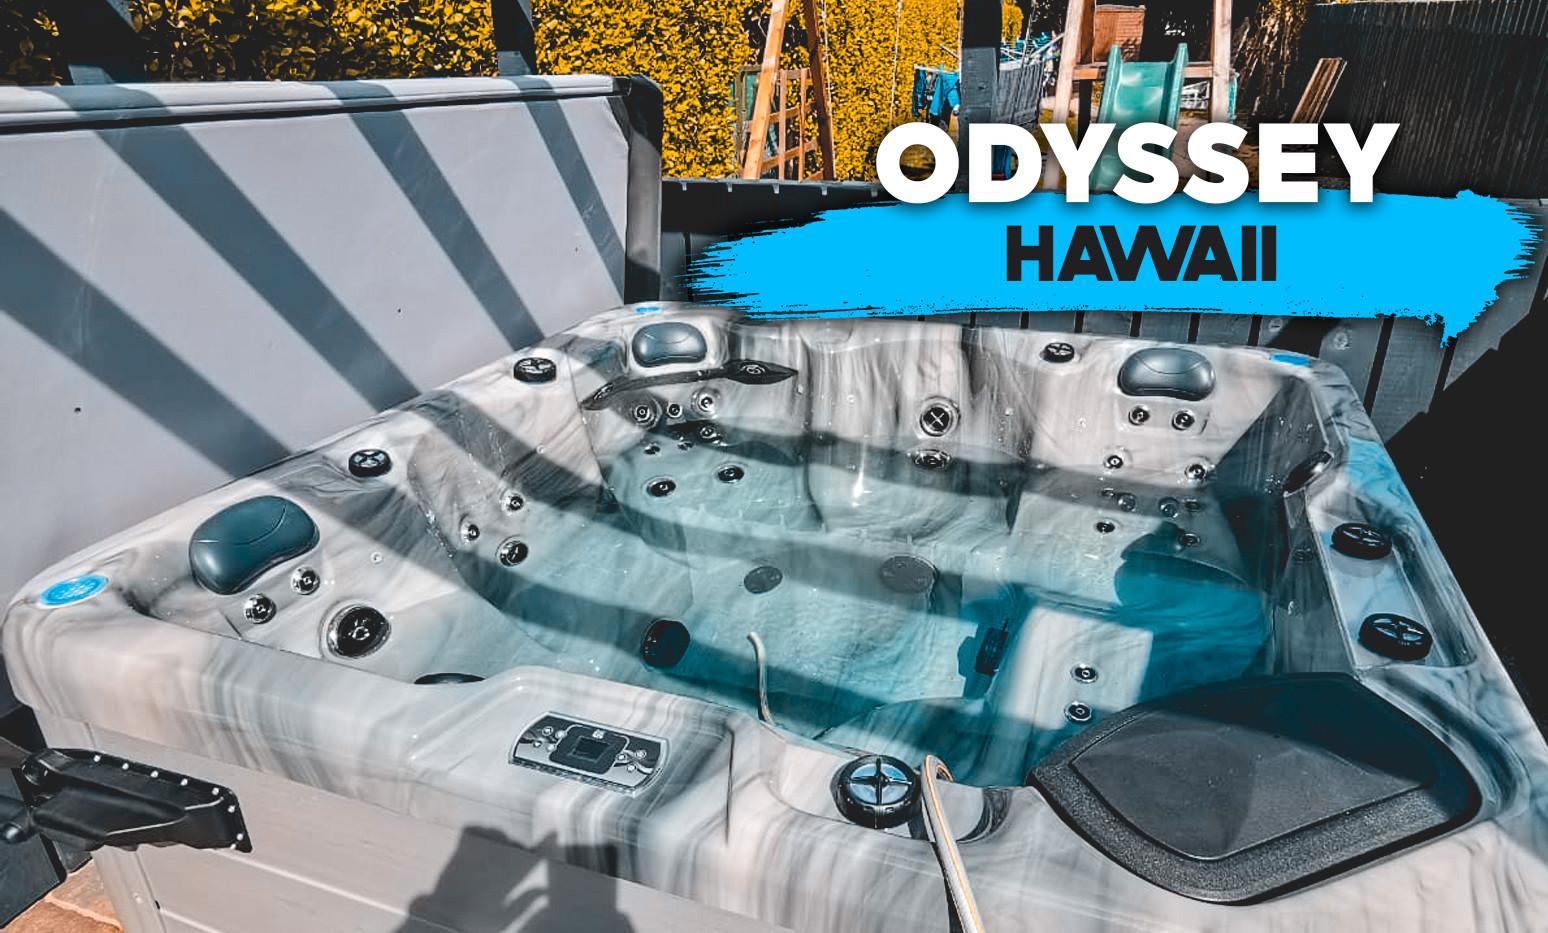 Hawaii_PreviousInstall_ODYSSEY.jpg